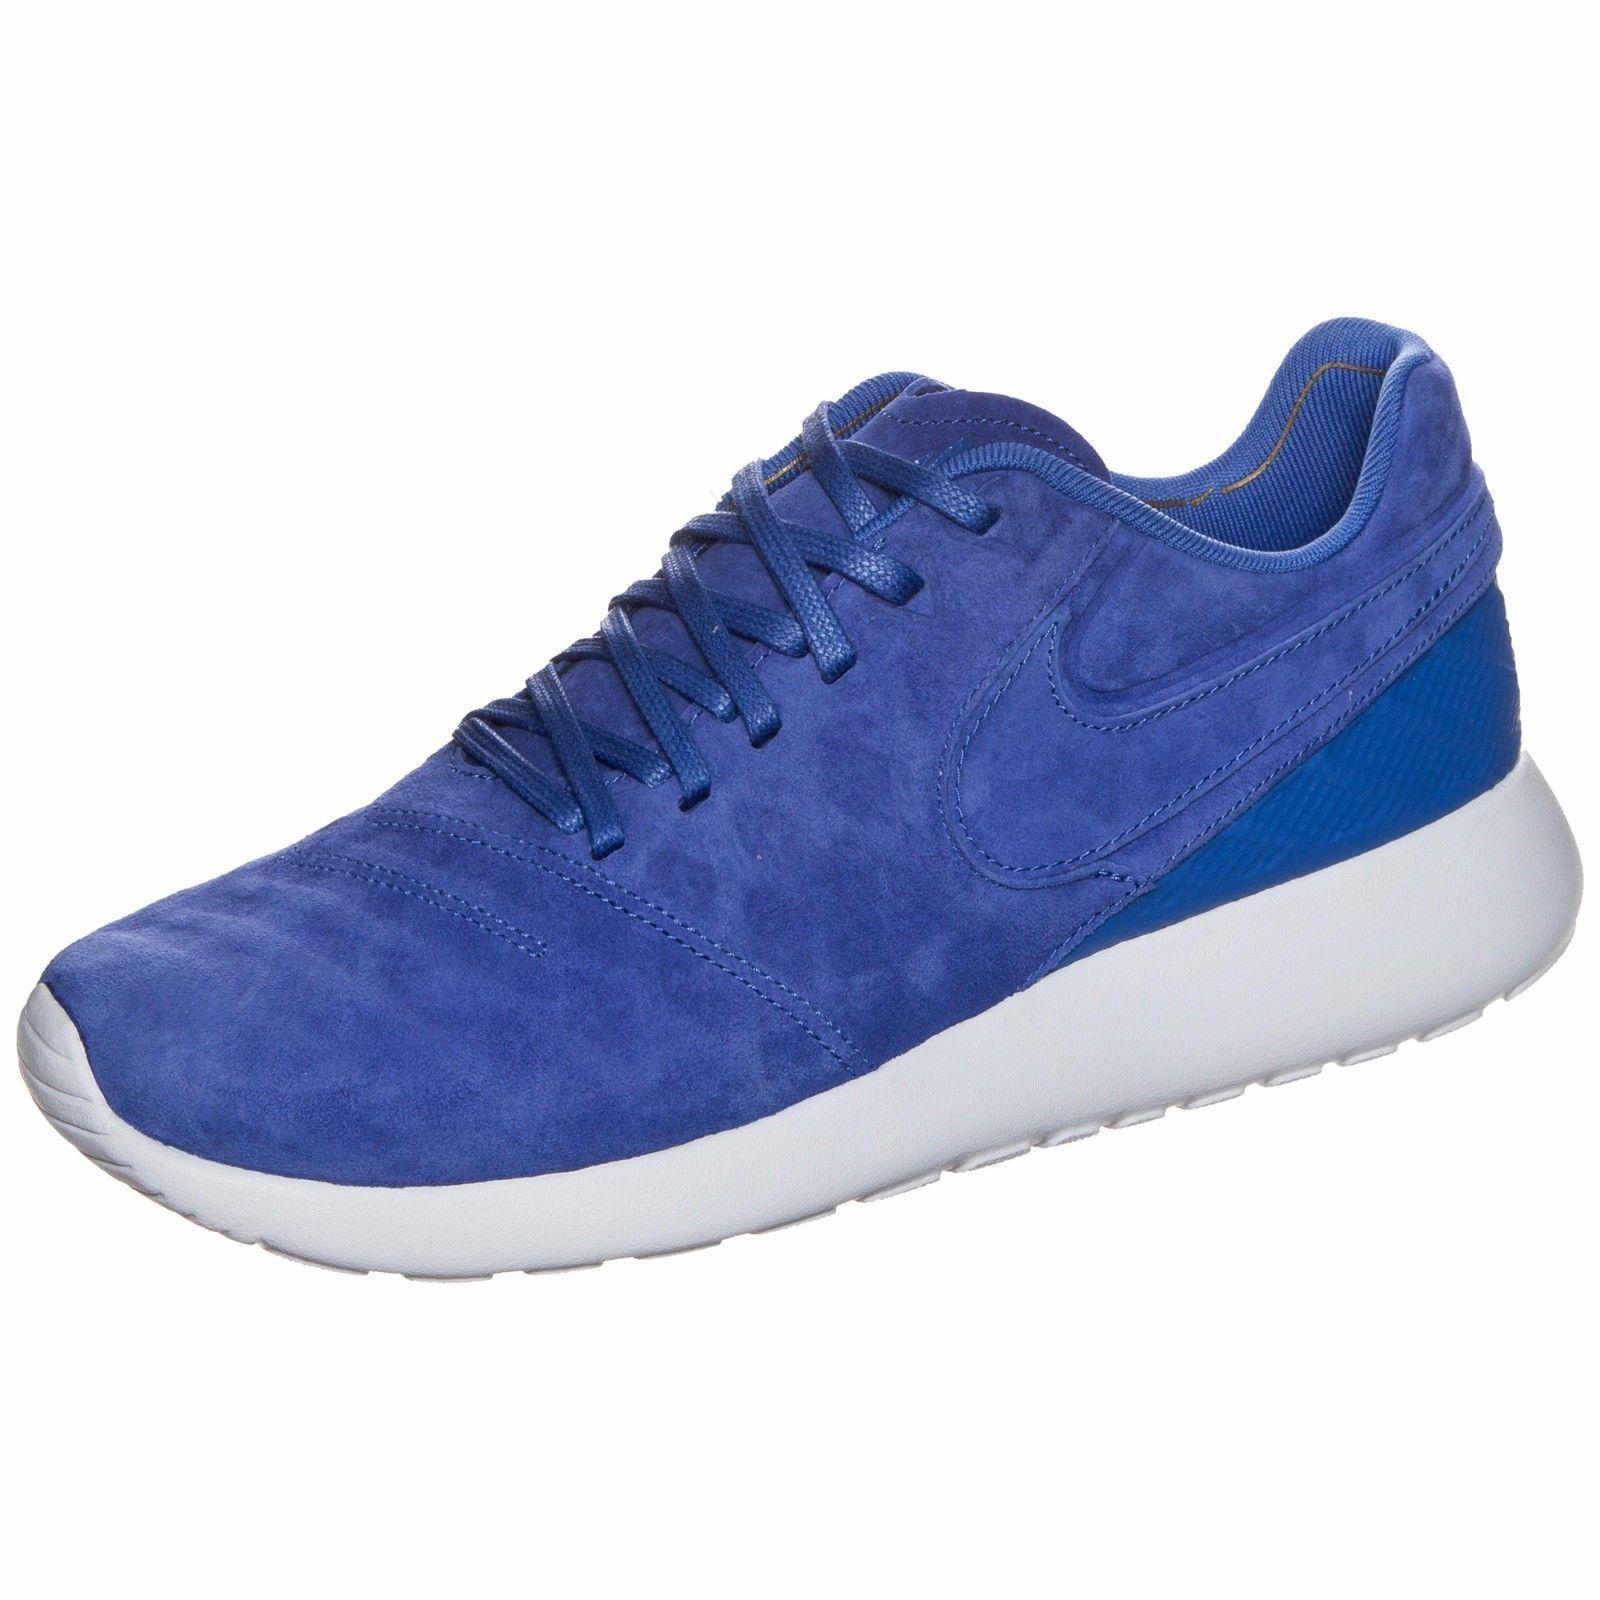 UOMO Nike Roshe Tiempo Vi Scarpe Comet Blu Bianco 852615 401 Msrp | Ordini Sono Benvenuti  | Gentiluomo/Signora Scarpa